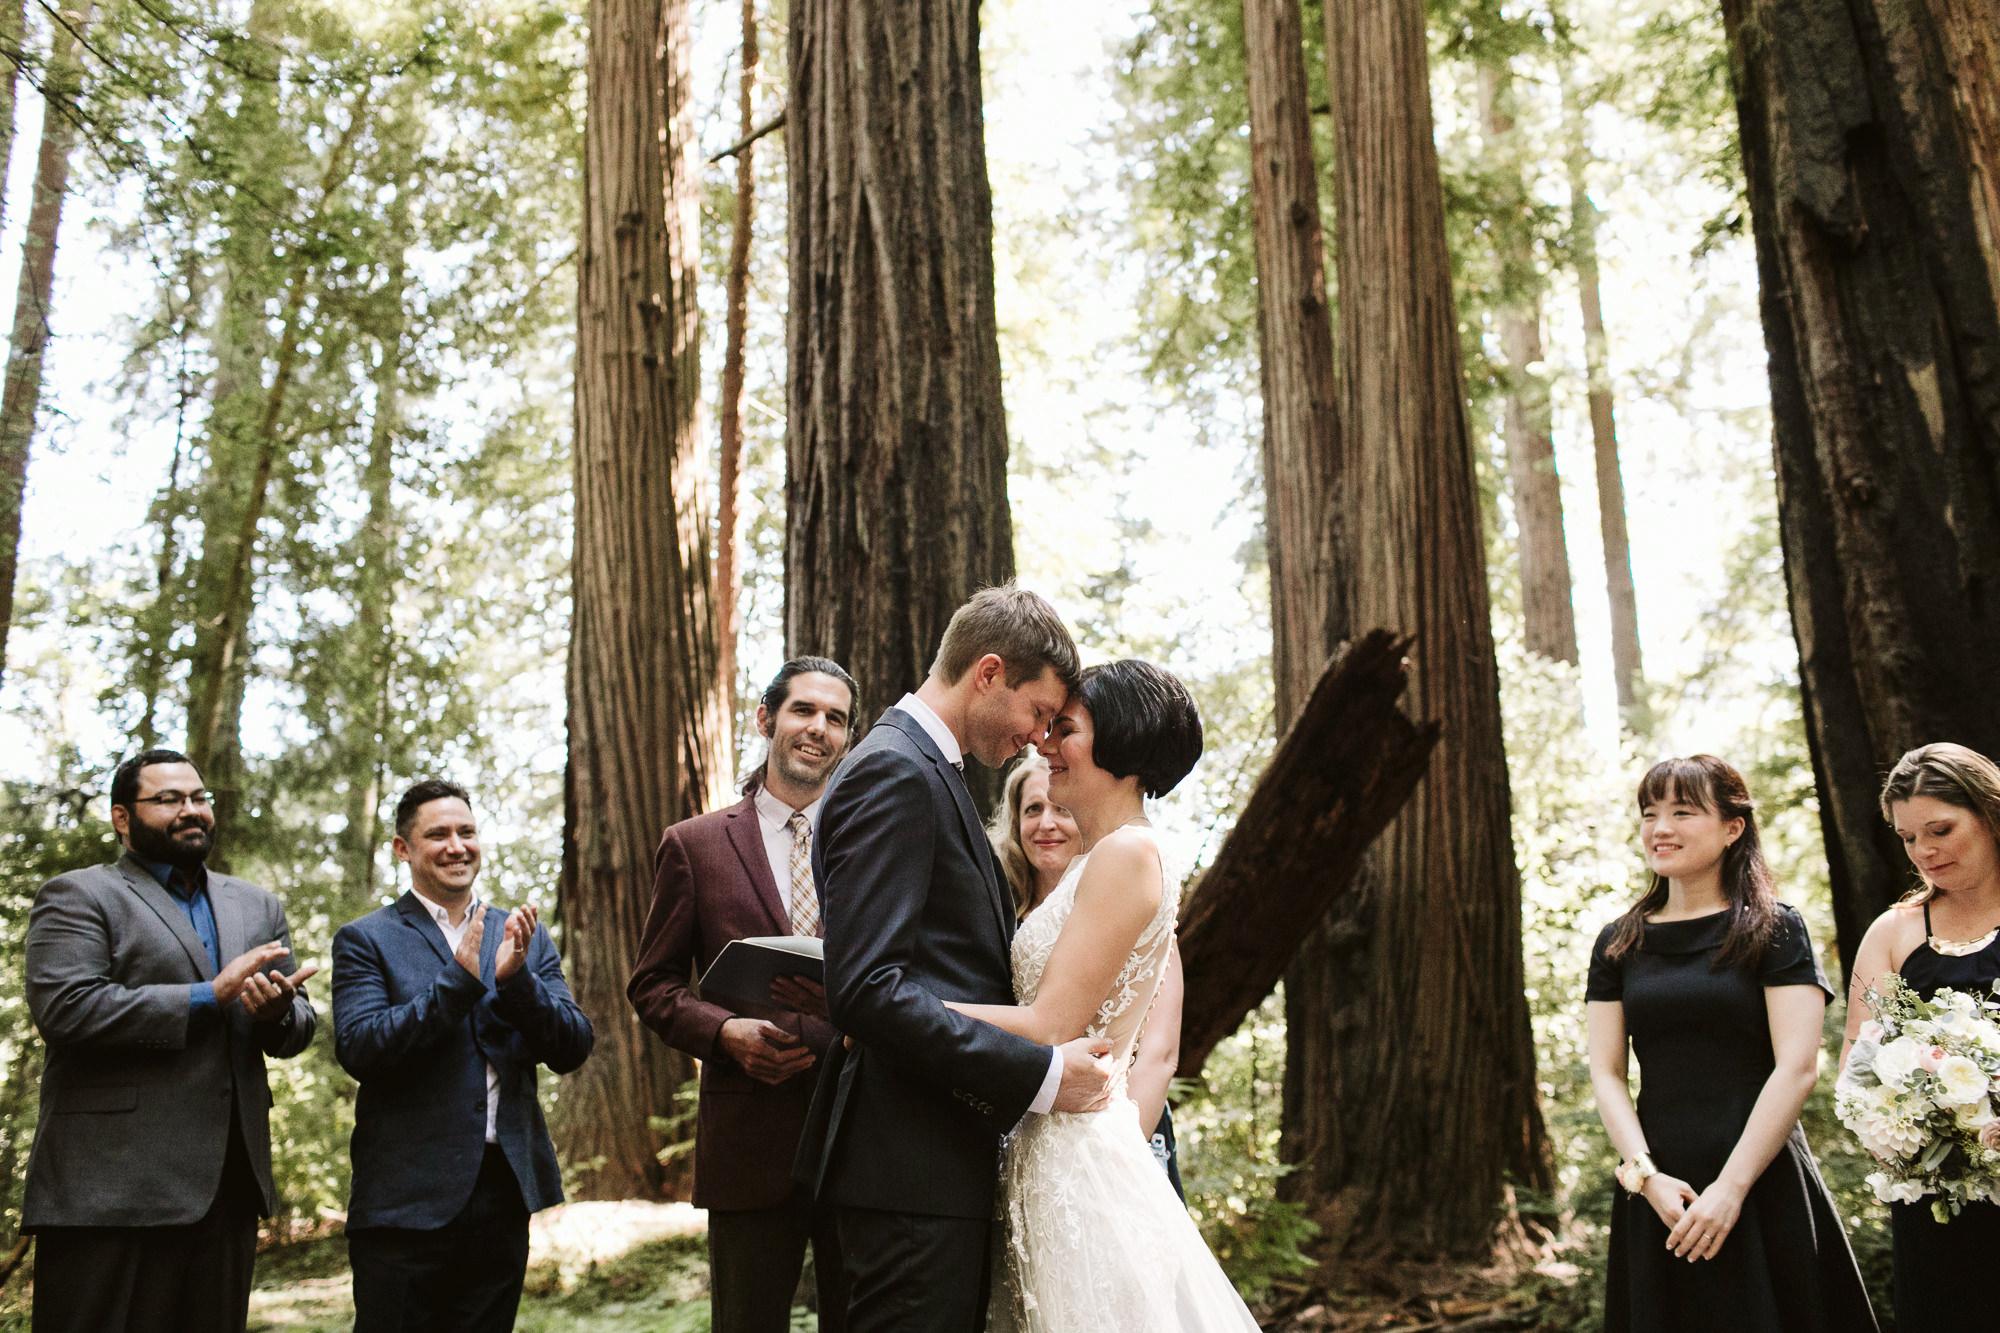 California-wedding-photographer-alfonso-flores-pamplin-groove-208.jpg